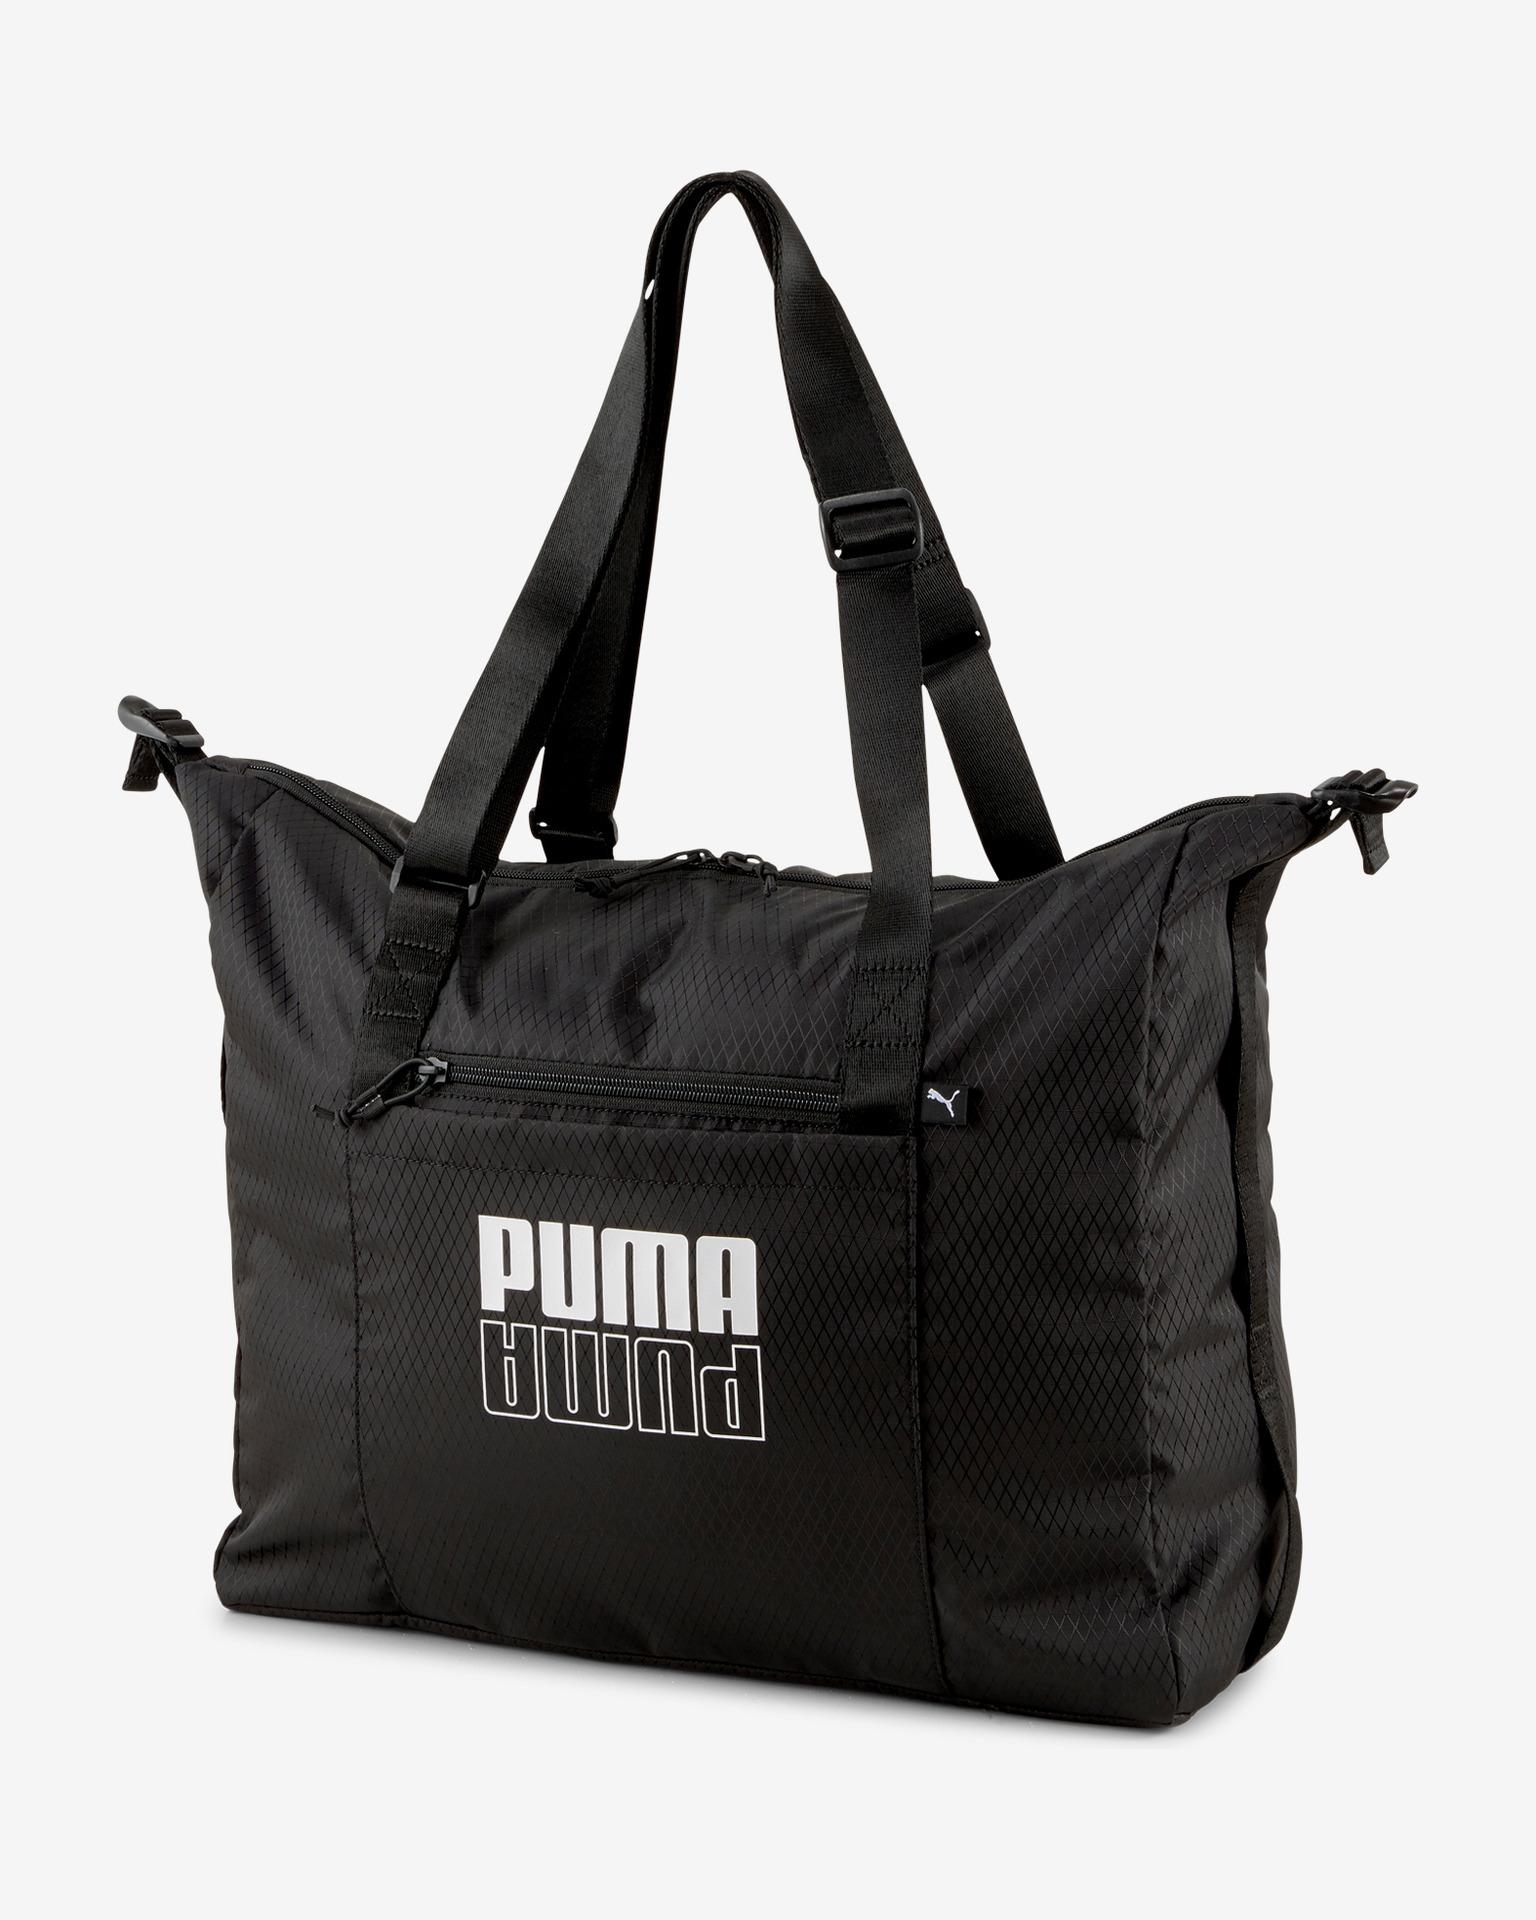 Puma Torba damska czarny